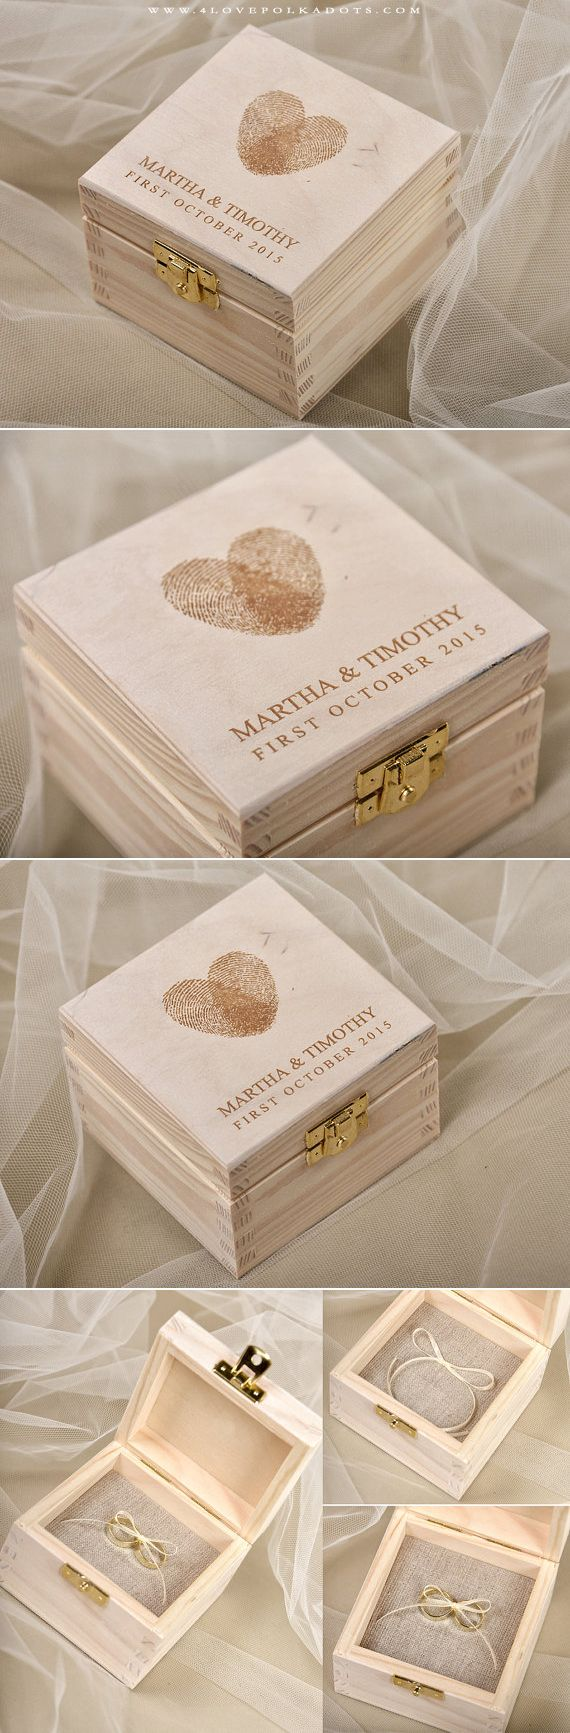 Wedding Wooden Ring Bearer Box with Fingerprints #realwood #weddingideas #summerwedding